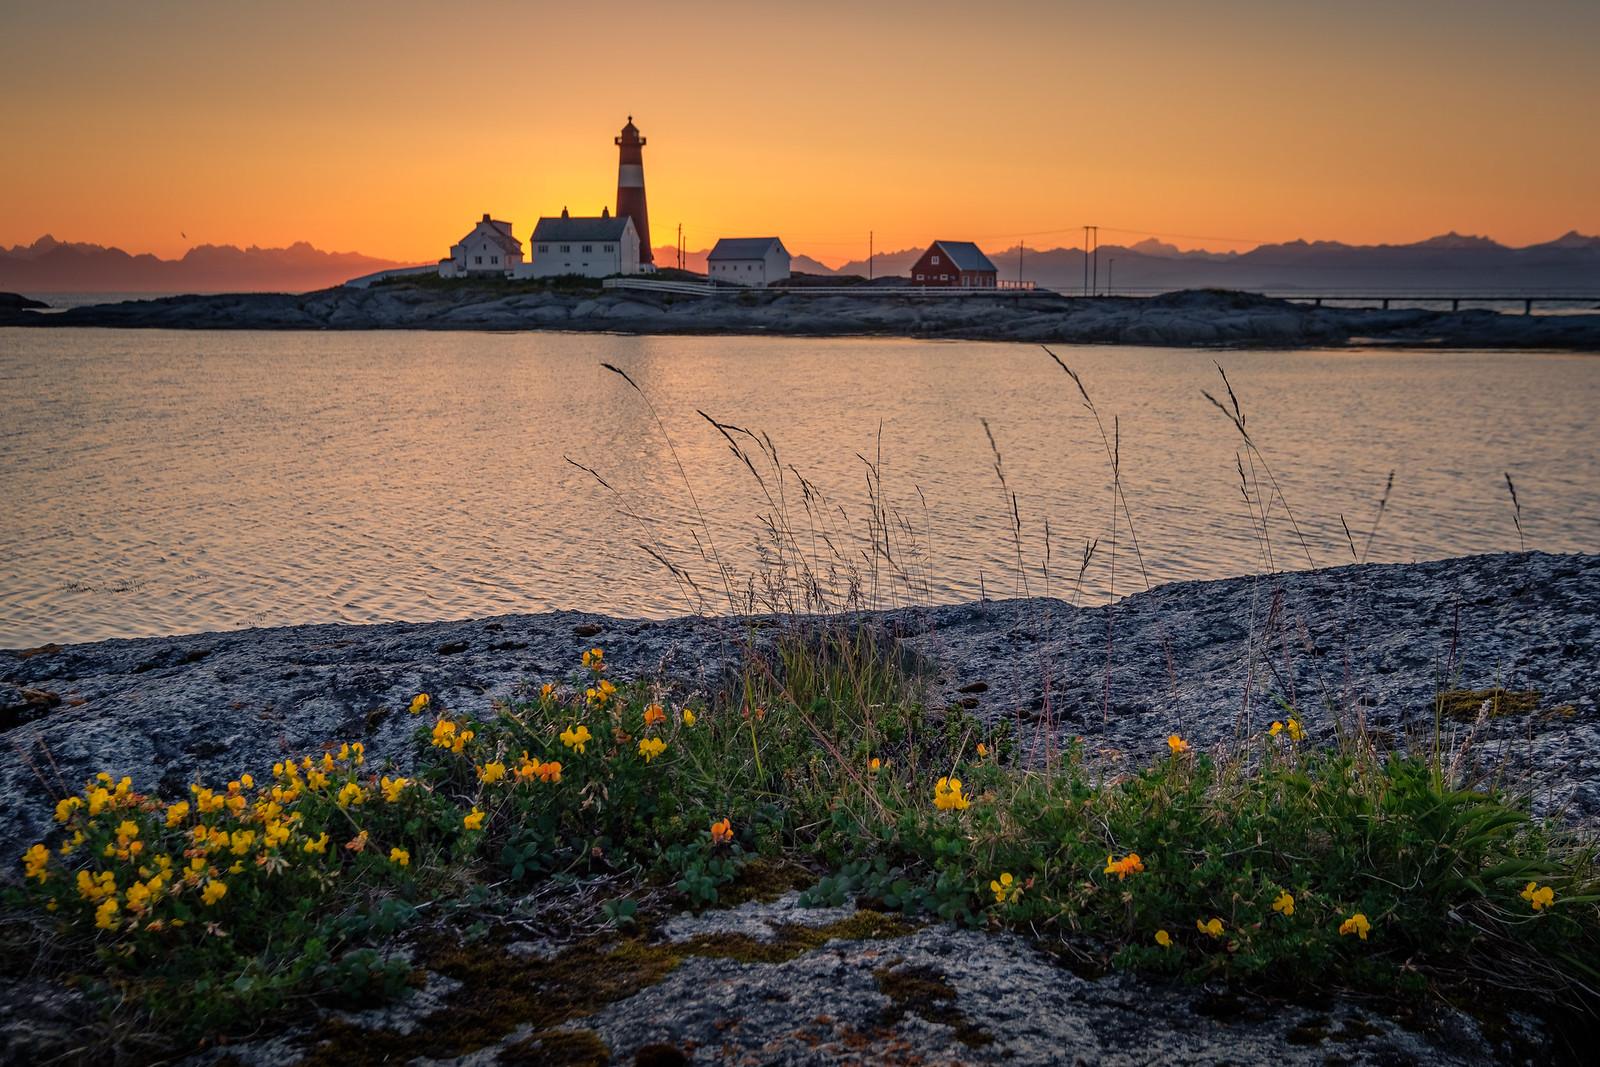 Midnight at Tranøy Lighthouse